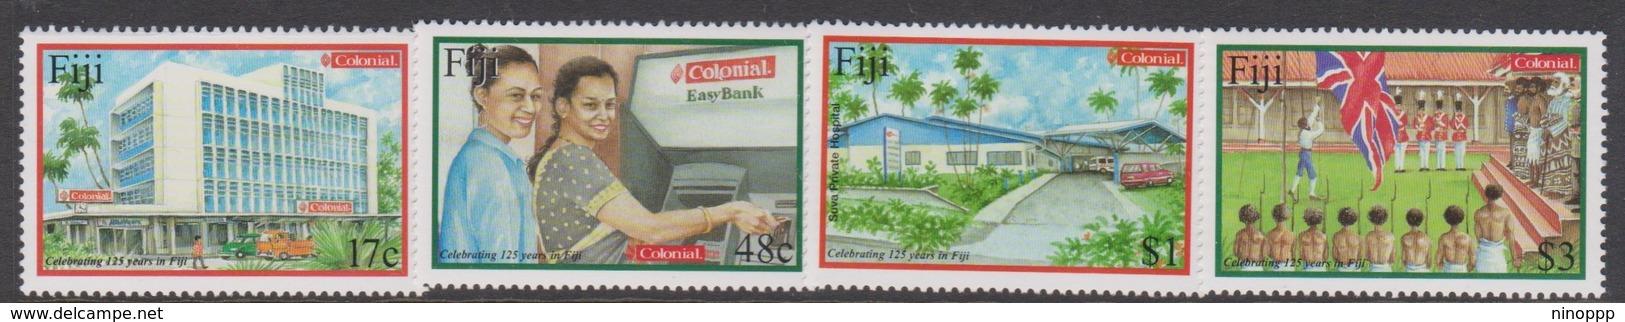 Fiji SG 1145-1148 2001 125th Anniversary Colonial Bank, Mint Never Hinged - Fiji (1970-...)